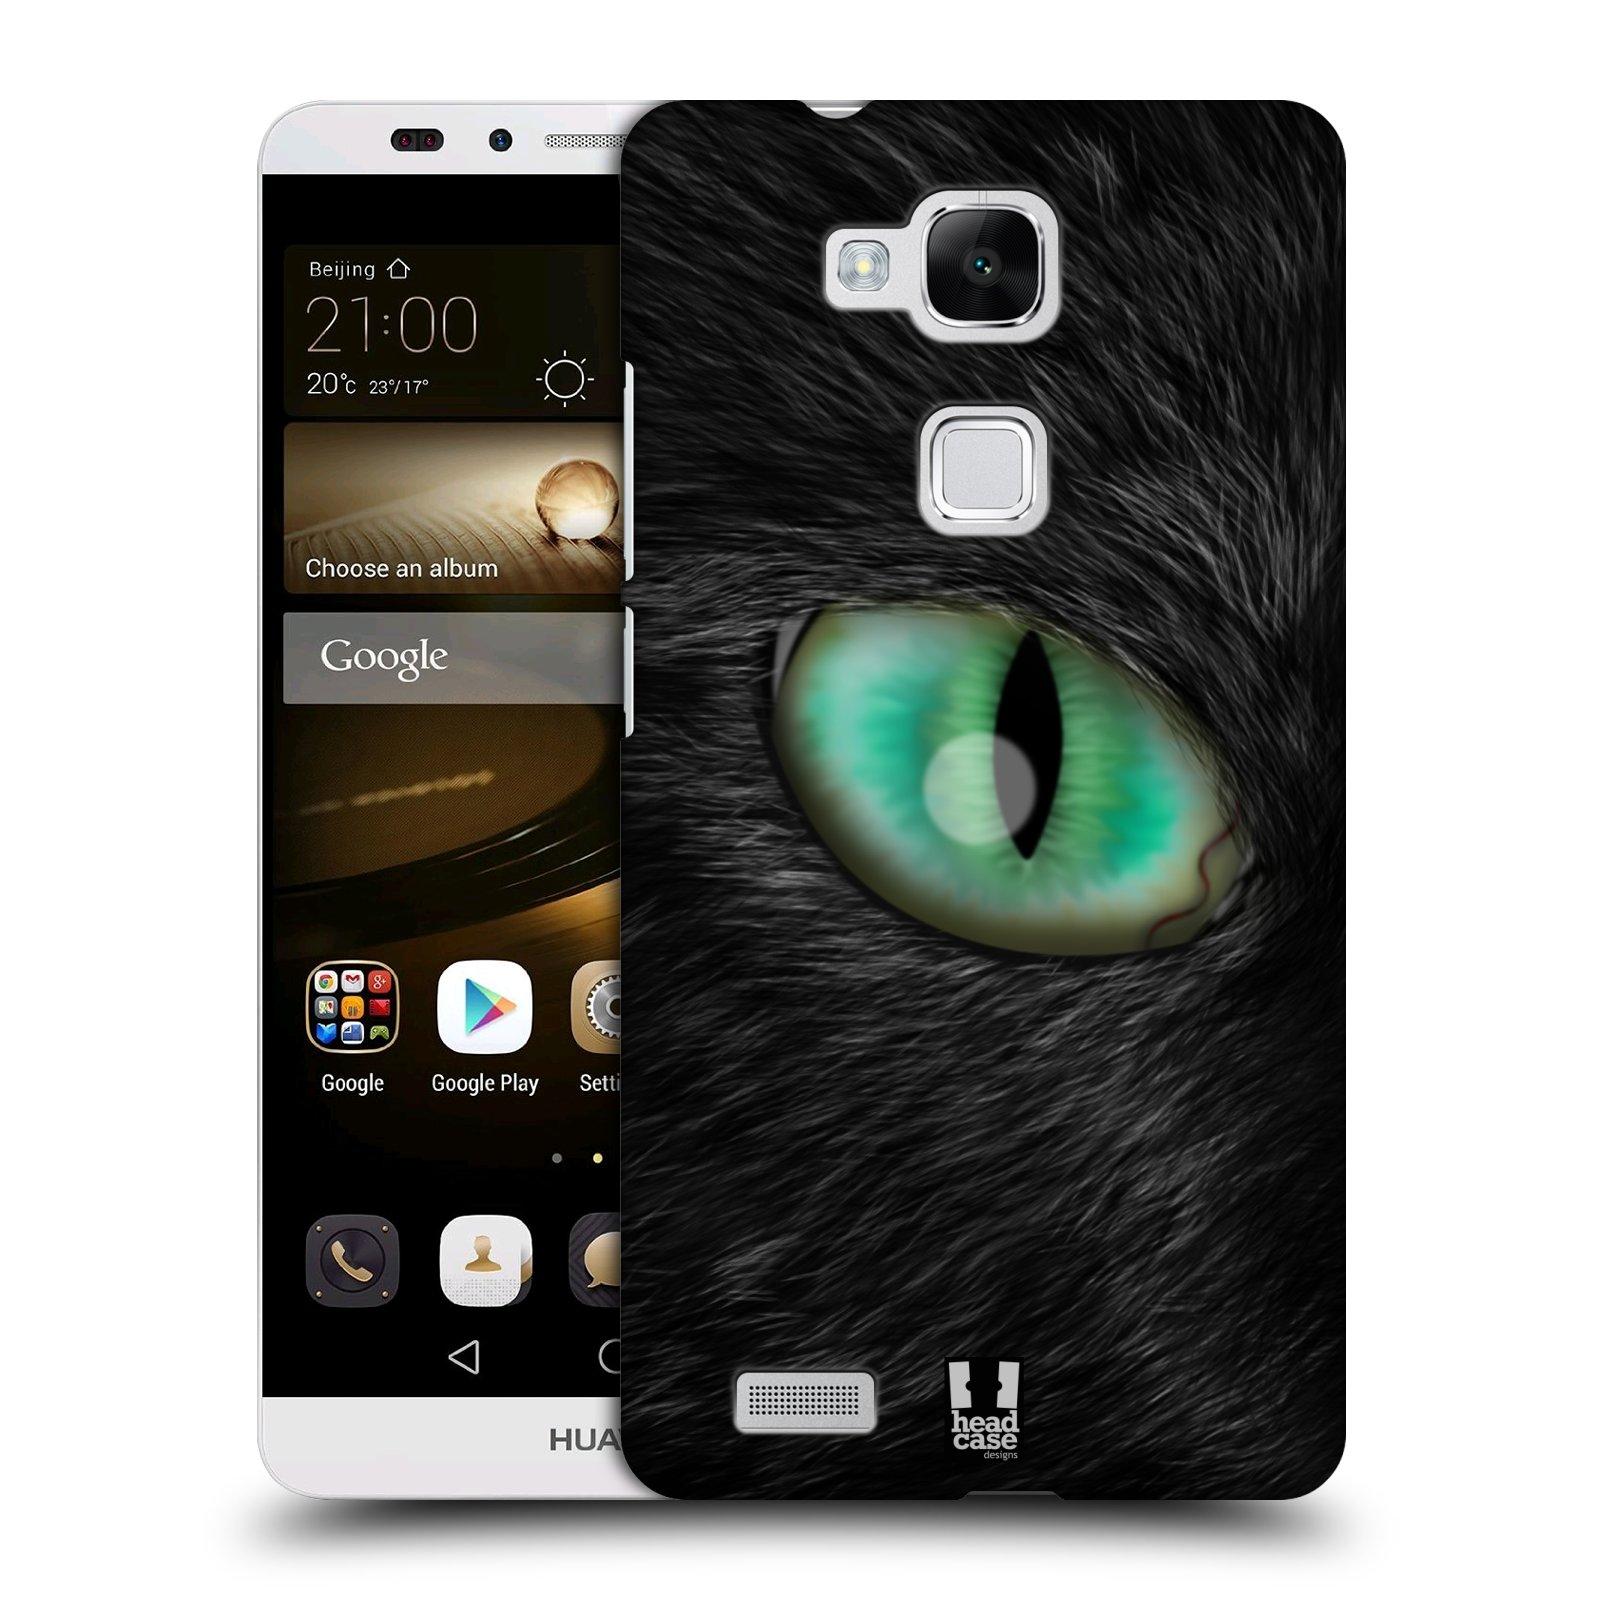 HEAD CASE plastový obal na mobil Huawei Mate 7 vzor pohled zvířete oko kočka